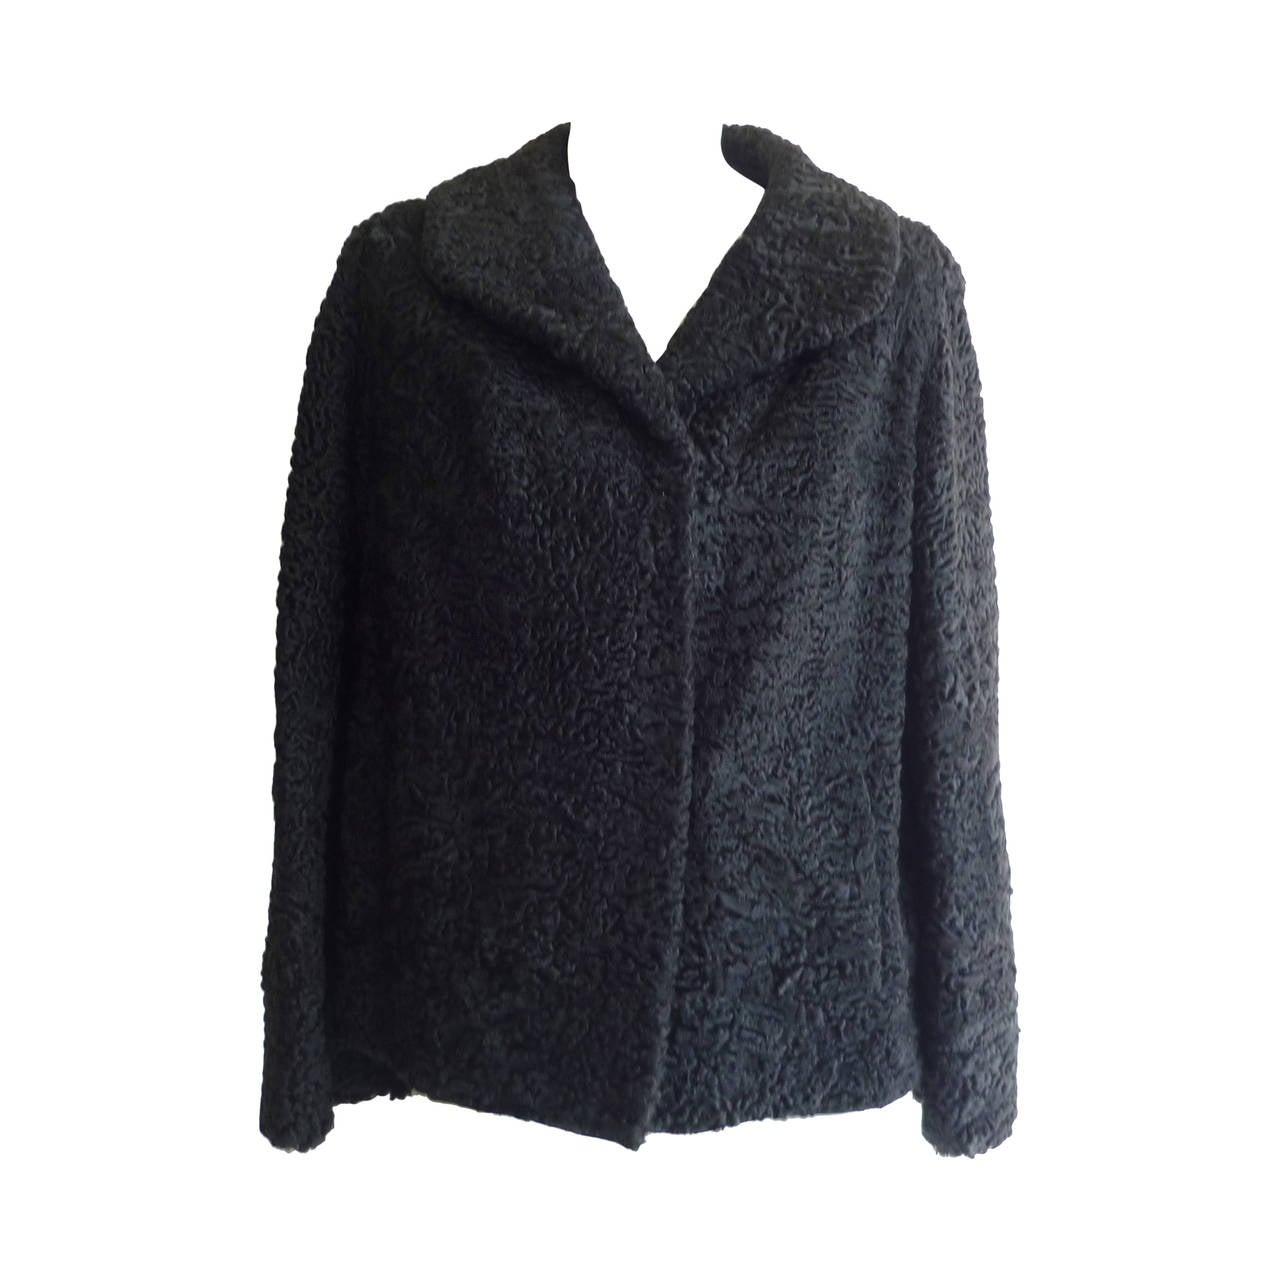 1940s - 50s Black Persian Lamb Jacket 6-8